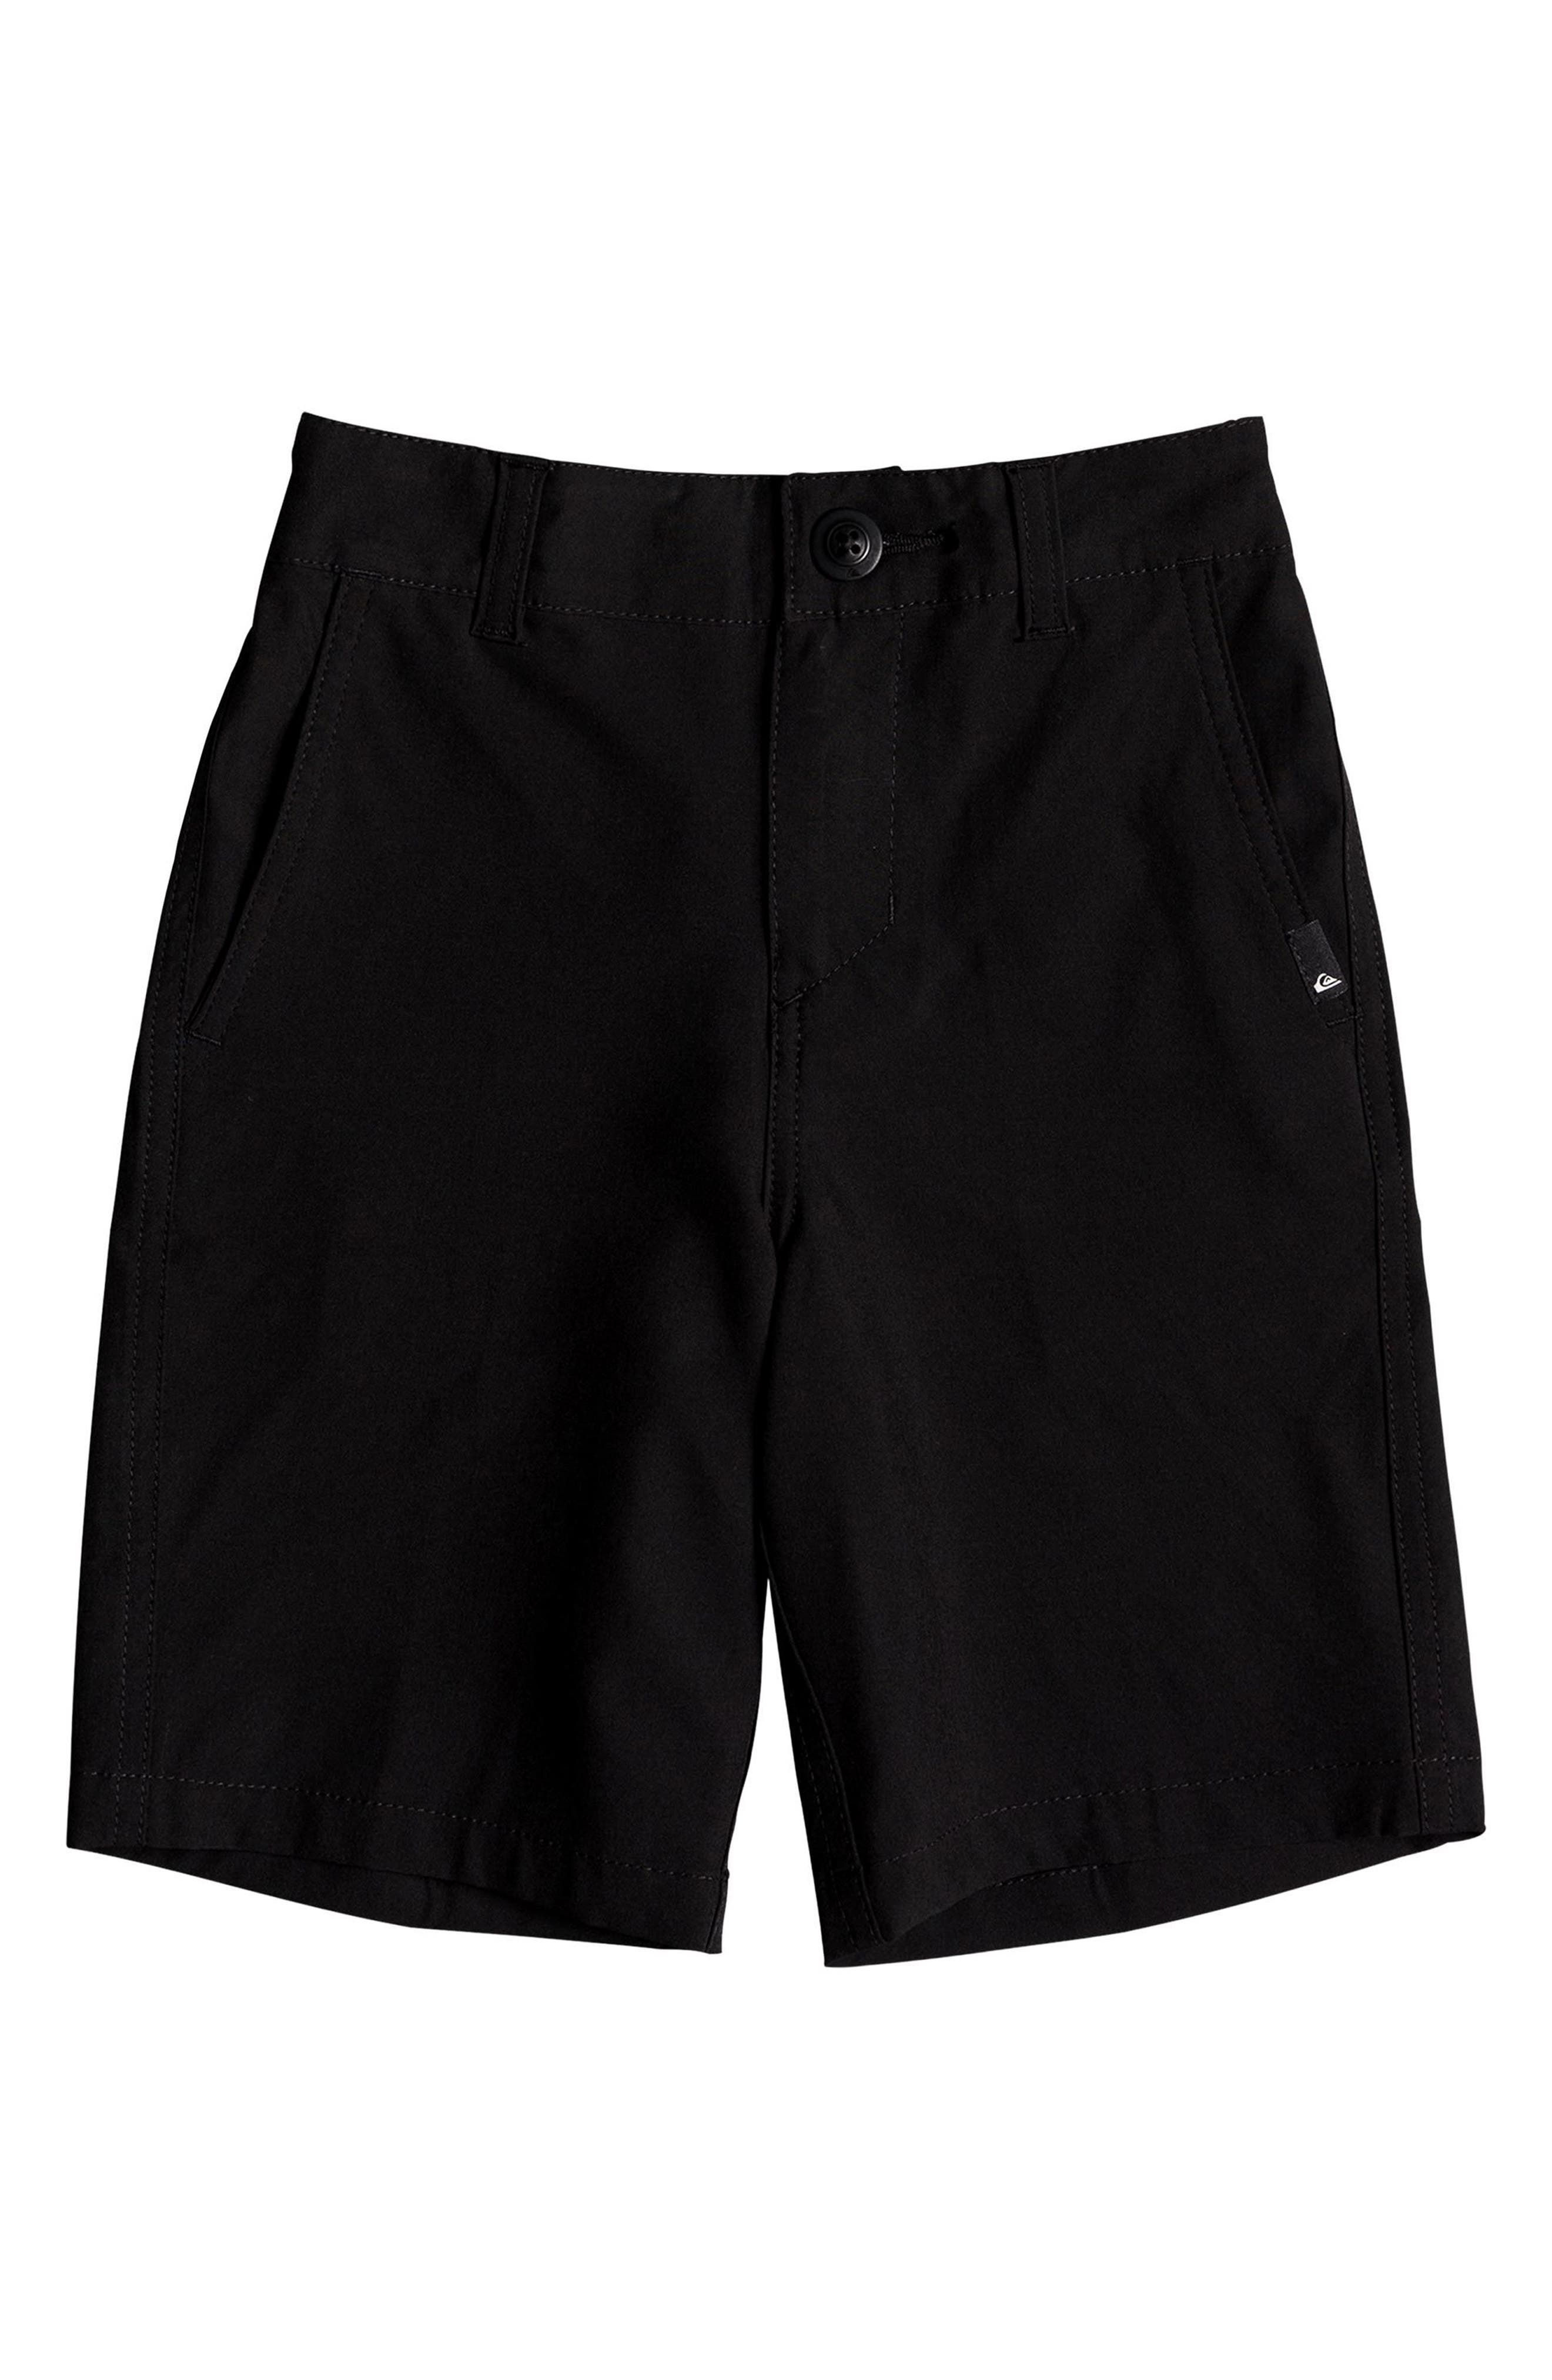 QUIKSILVER,                             Union Amphibian Hybrid Shorts,                             Main thumbnail 1, color,                             BLACK